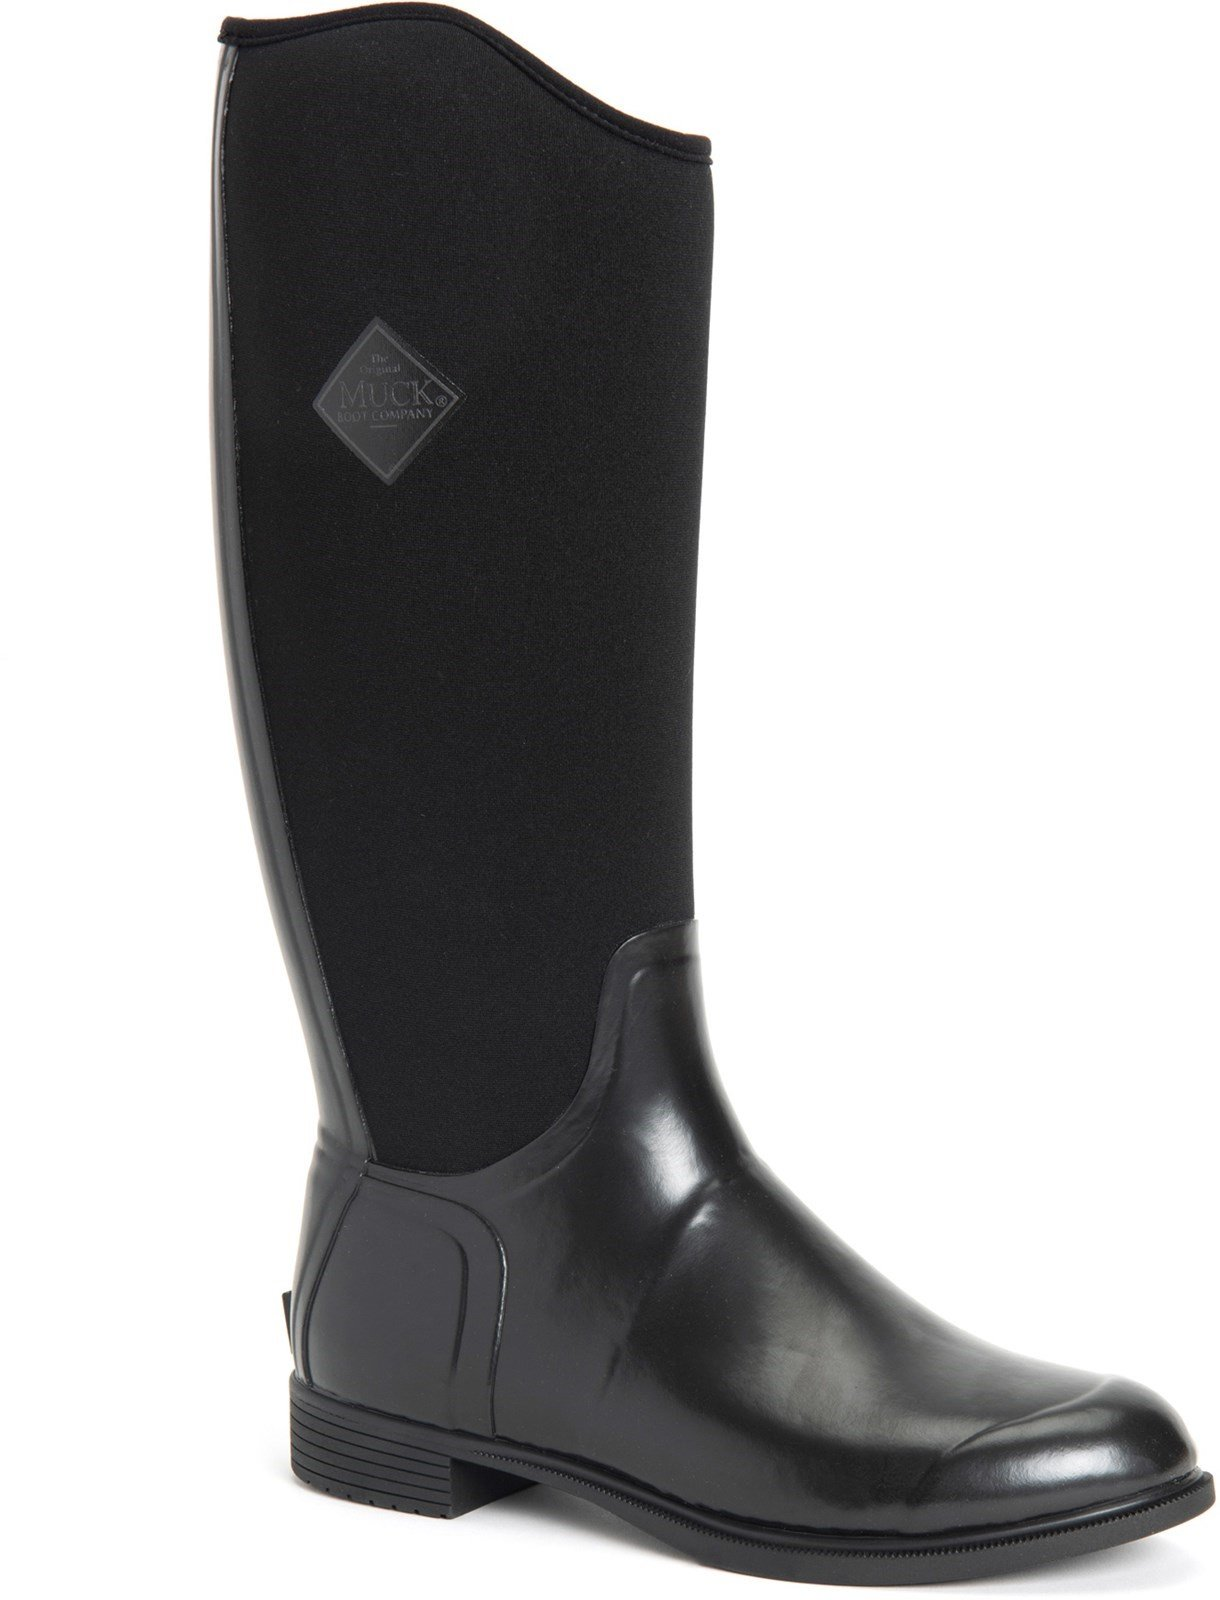 Muck Boots Unisex Derby Tall Boot Black 30983 - Black 3